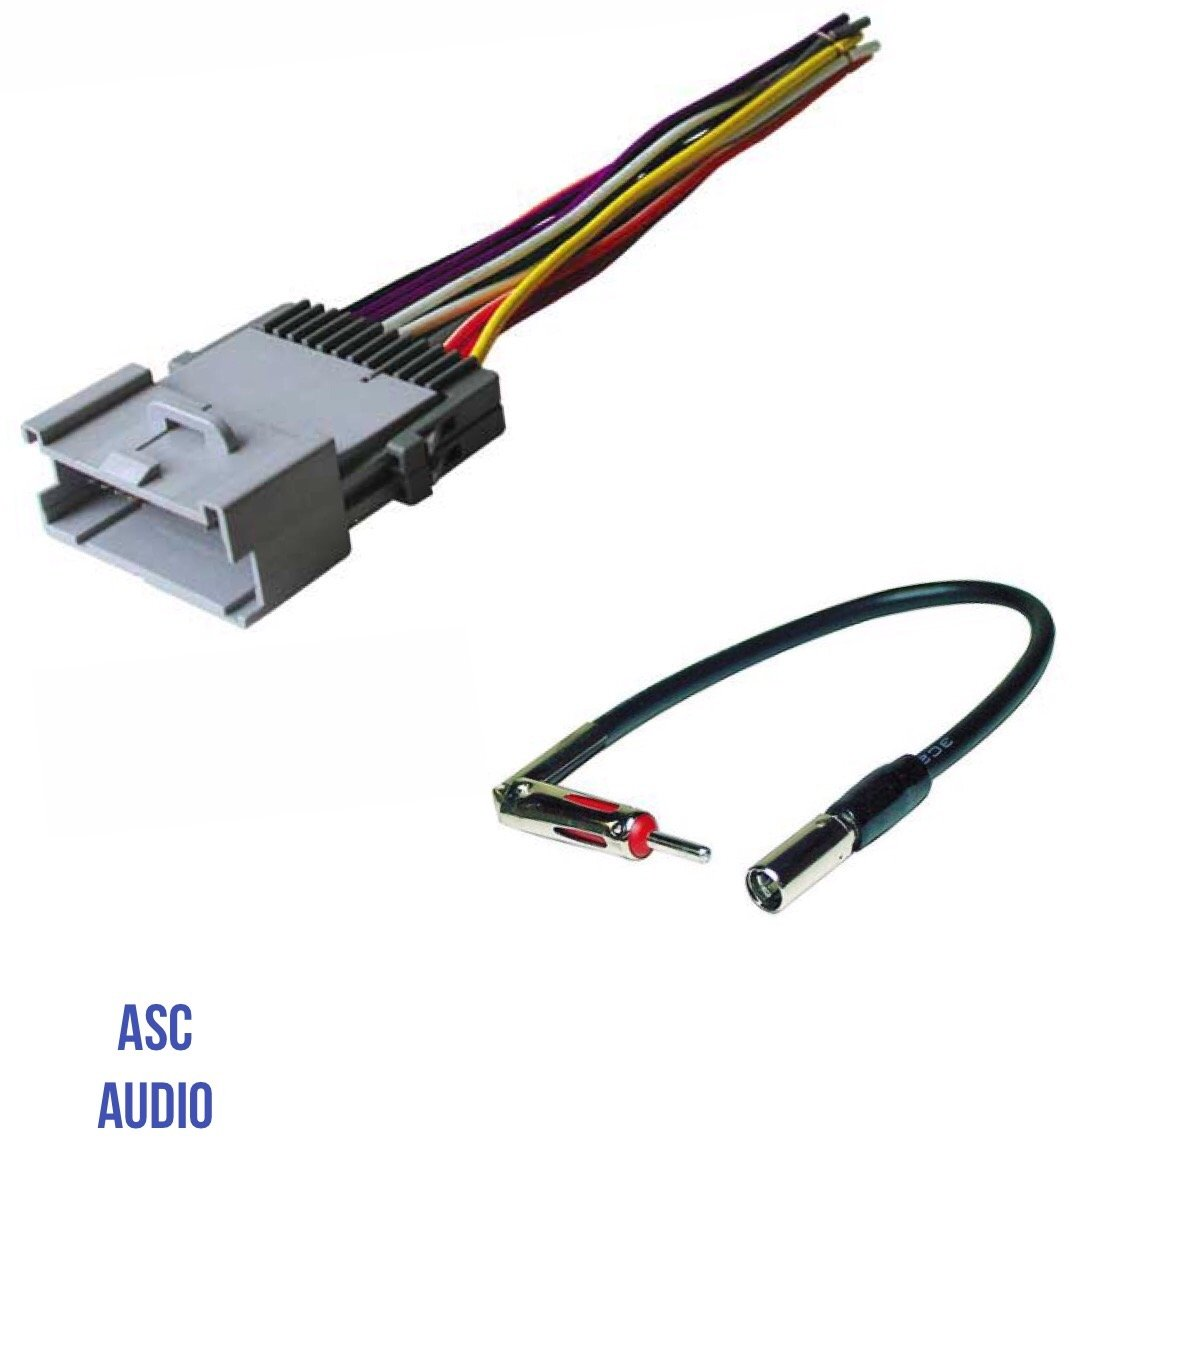 Amazon.com: ASC Car Stereo Wire Harness and Antenna Adapter for GM: 03-05  Blazer/S-10, 01-02 Express,00-01 Metro,00-03 Prizm,98-04 Tracker;01-02  Savana ...